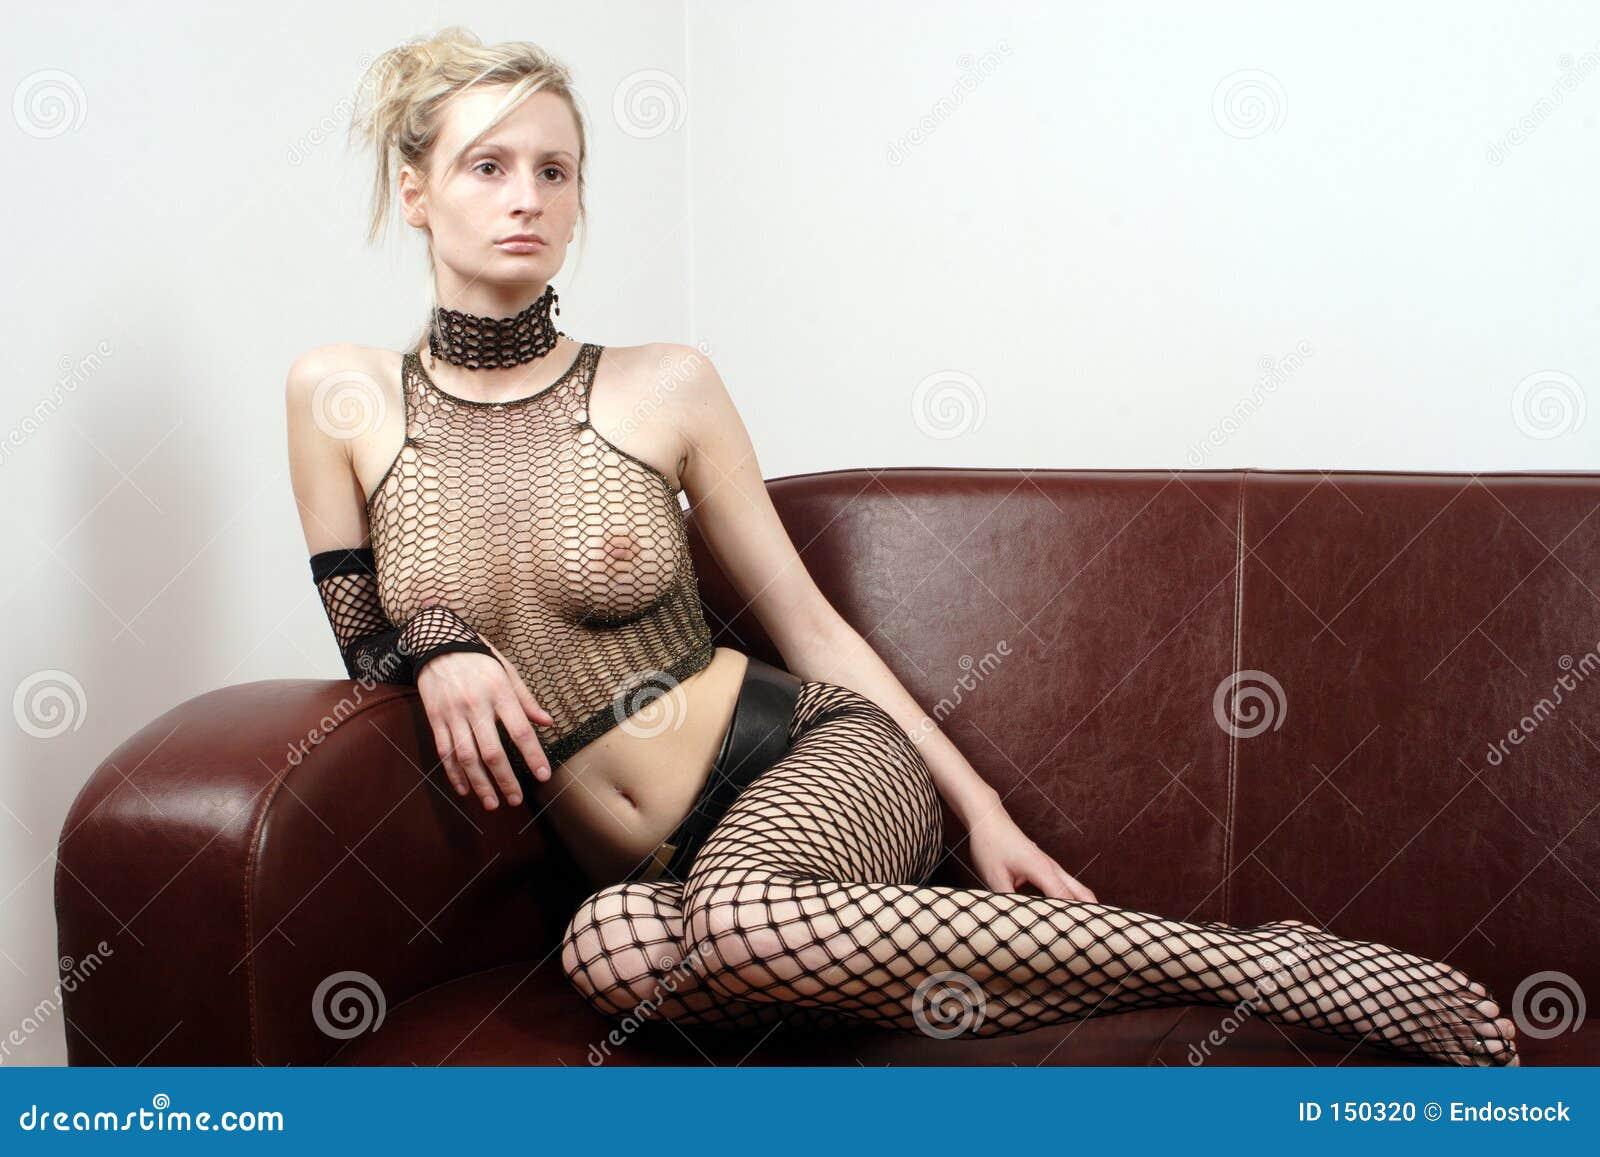 Attractive woman sitting on sofa